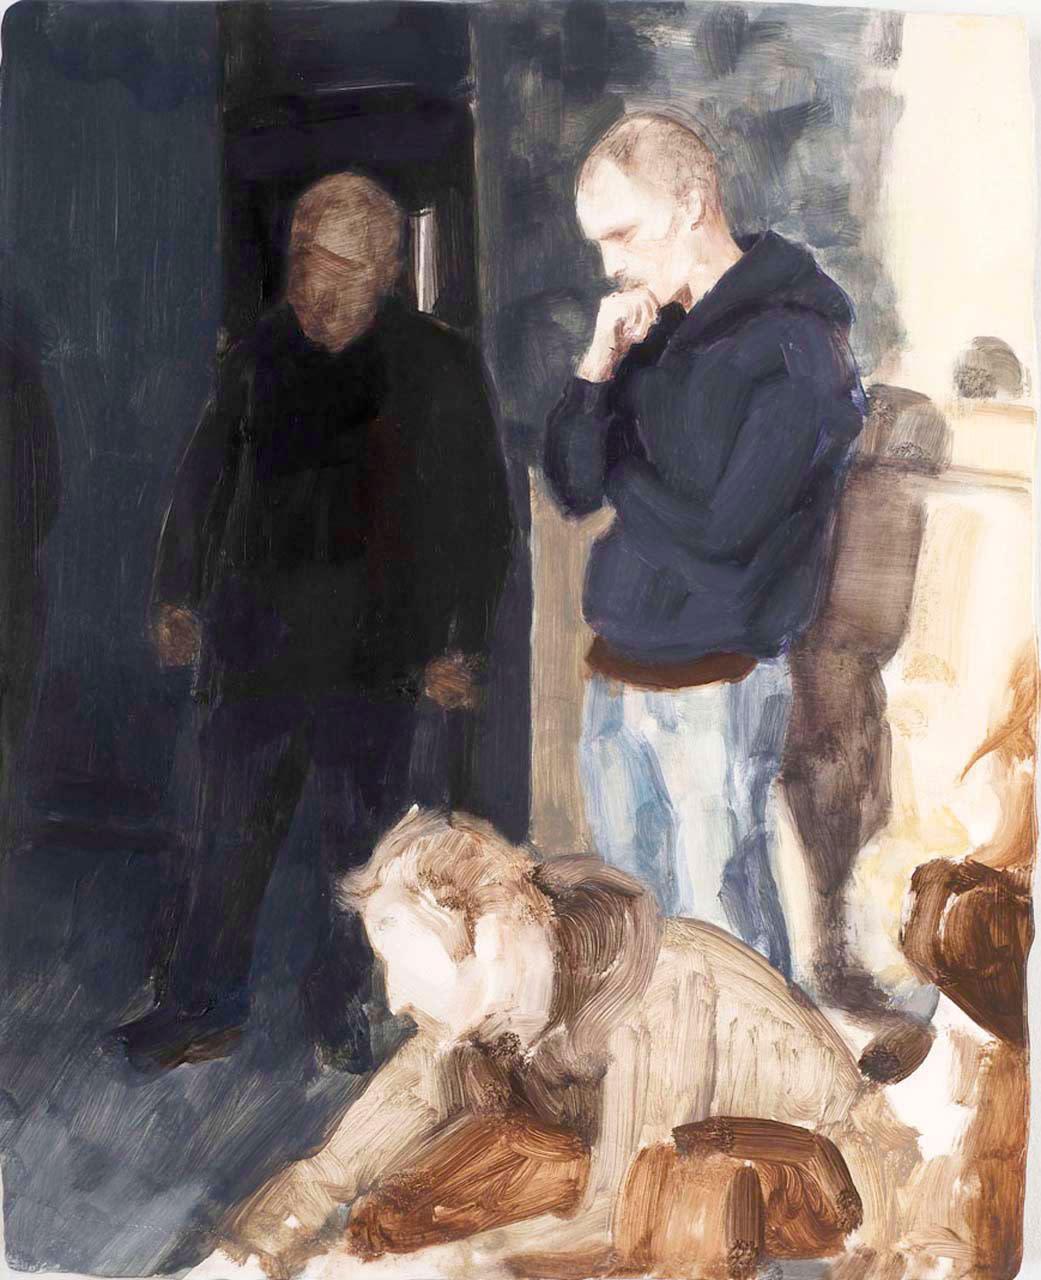 "<div class=""artwork_caption""><p>Dakis, Matthew and Boris, 2009</p></div>"